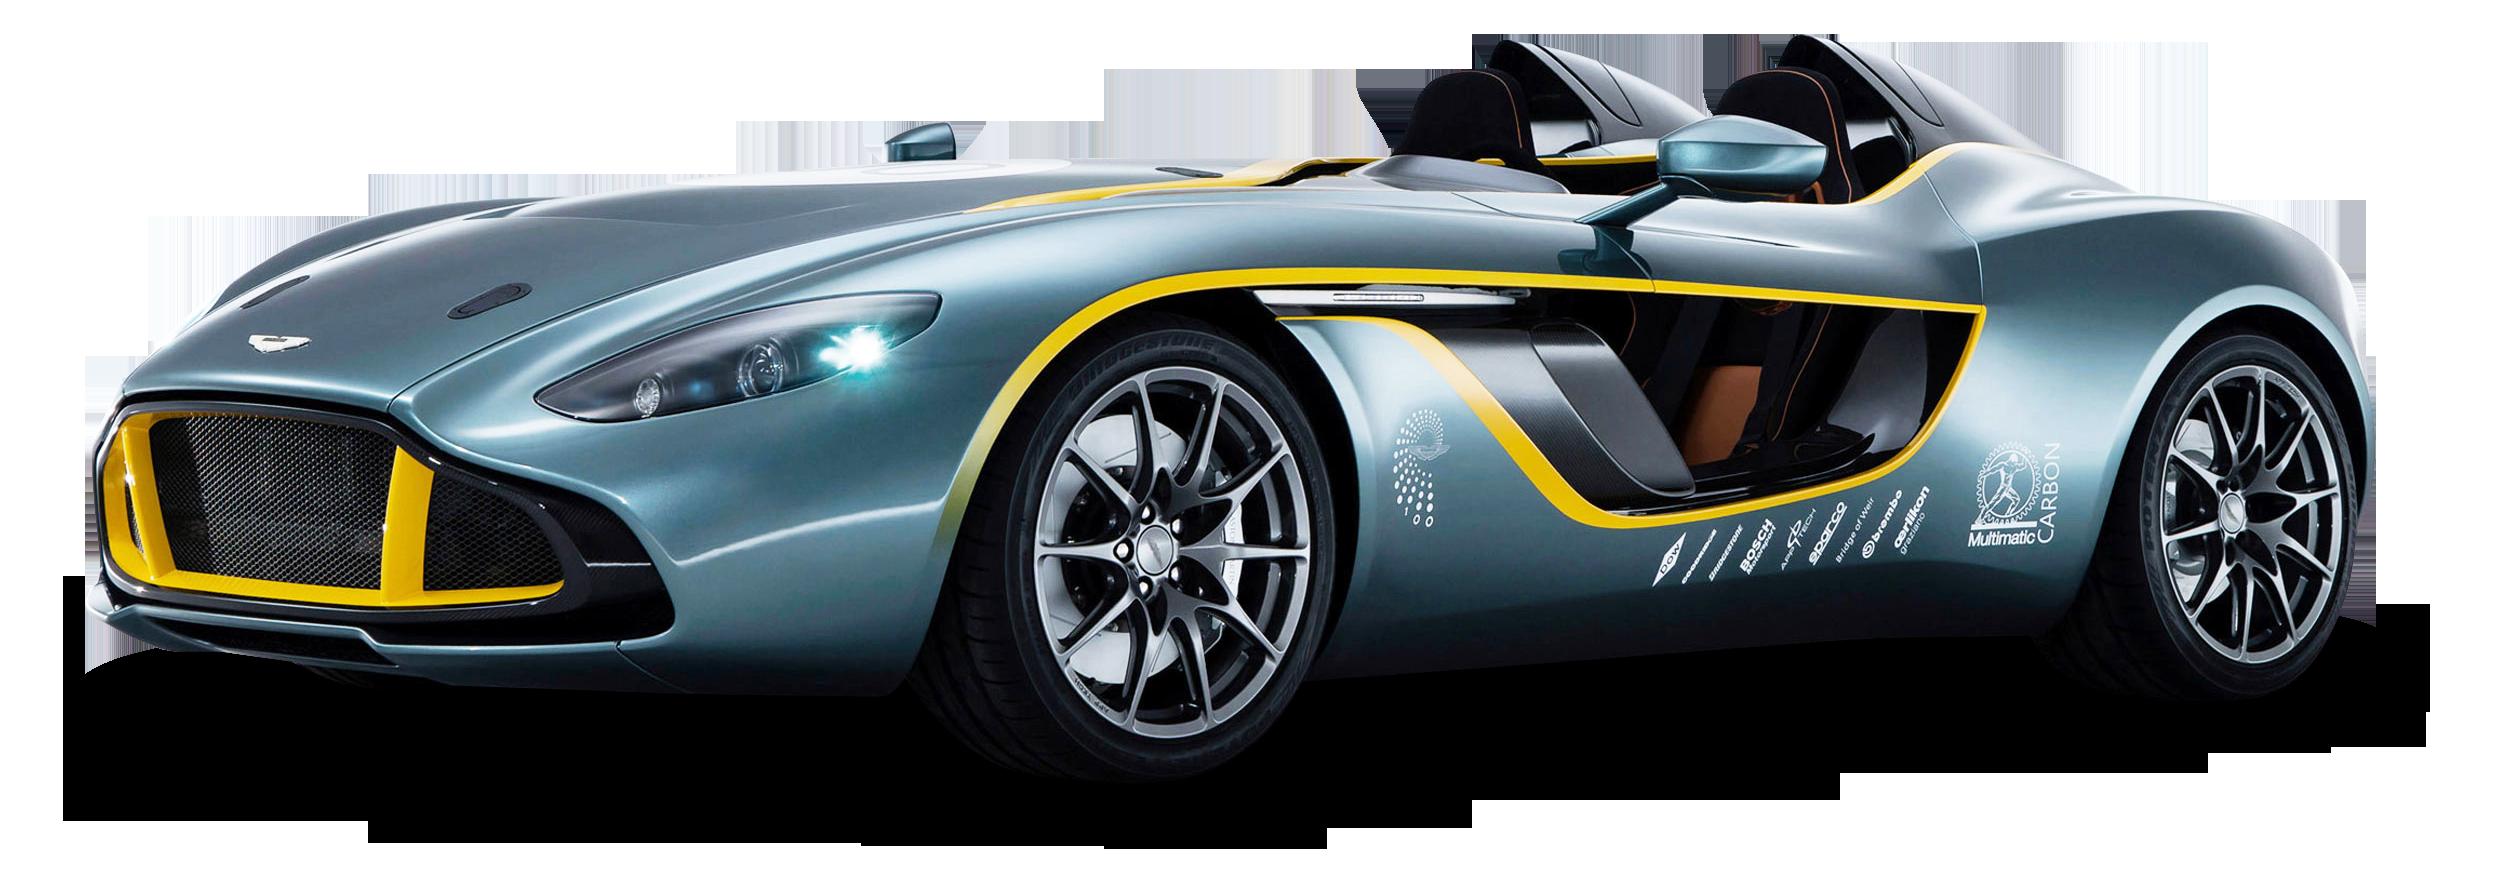 Aston Martin CC100 Speedster Car